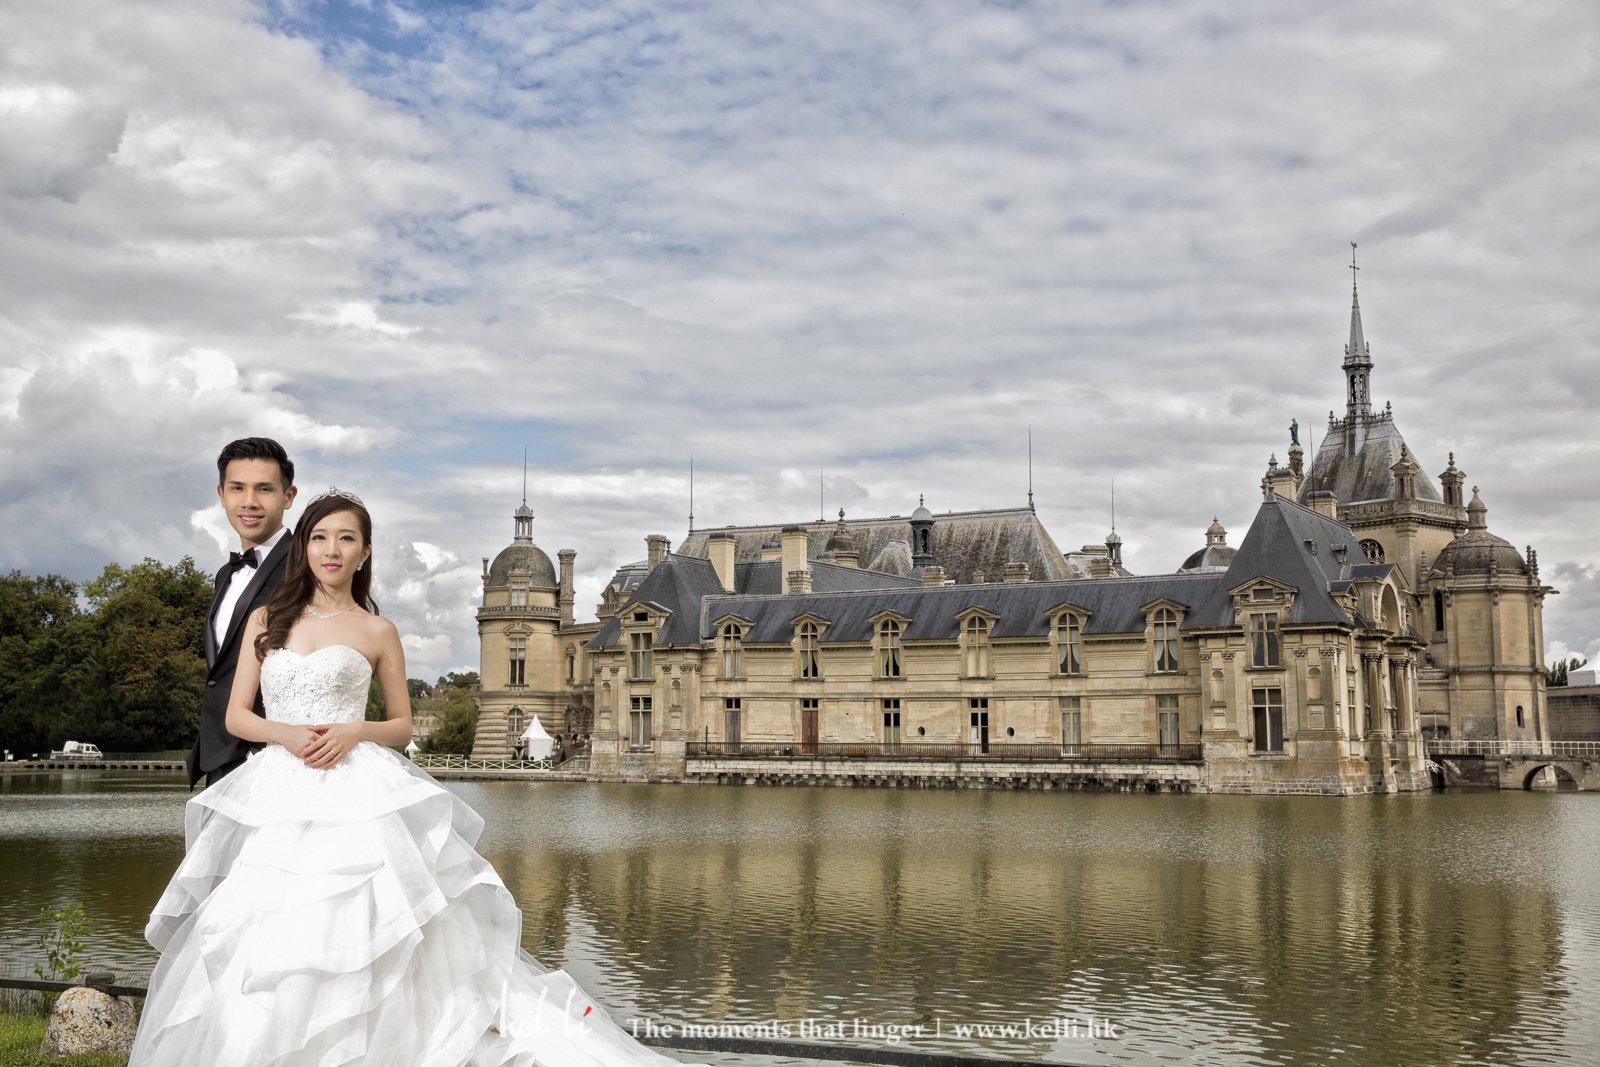 Chateau de Chantilly 城堡雖然車程比較遠,但城堡的美景也很值得